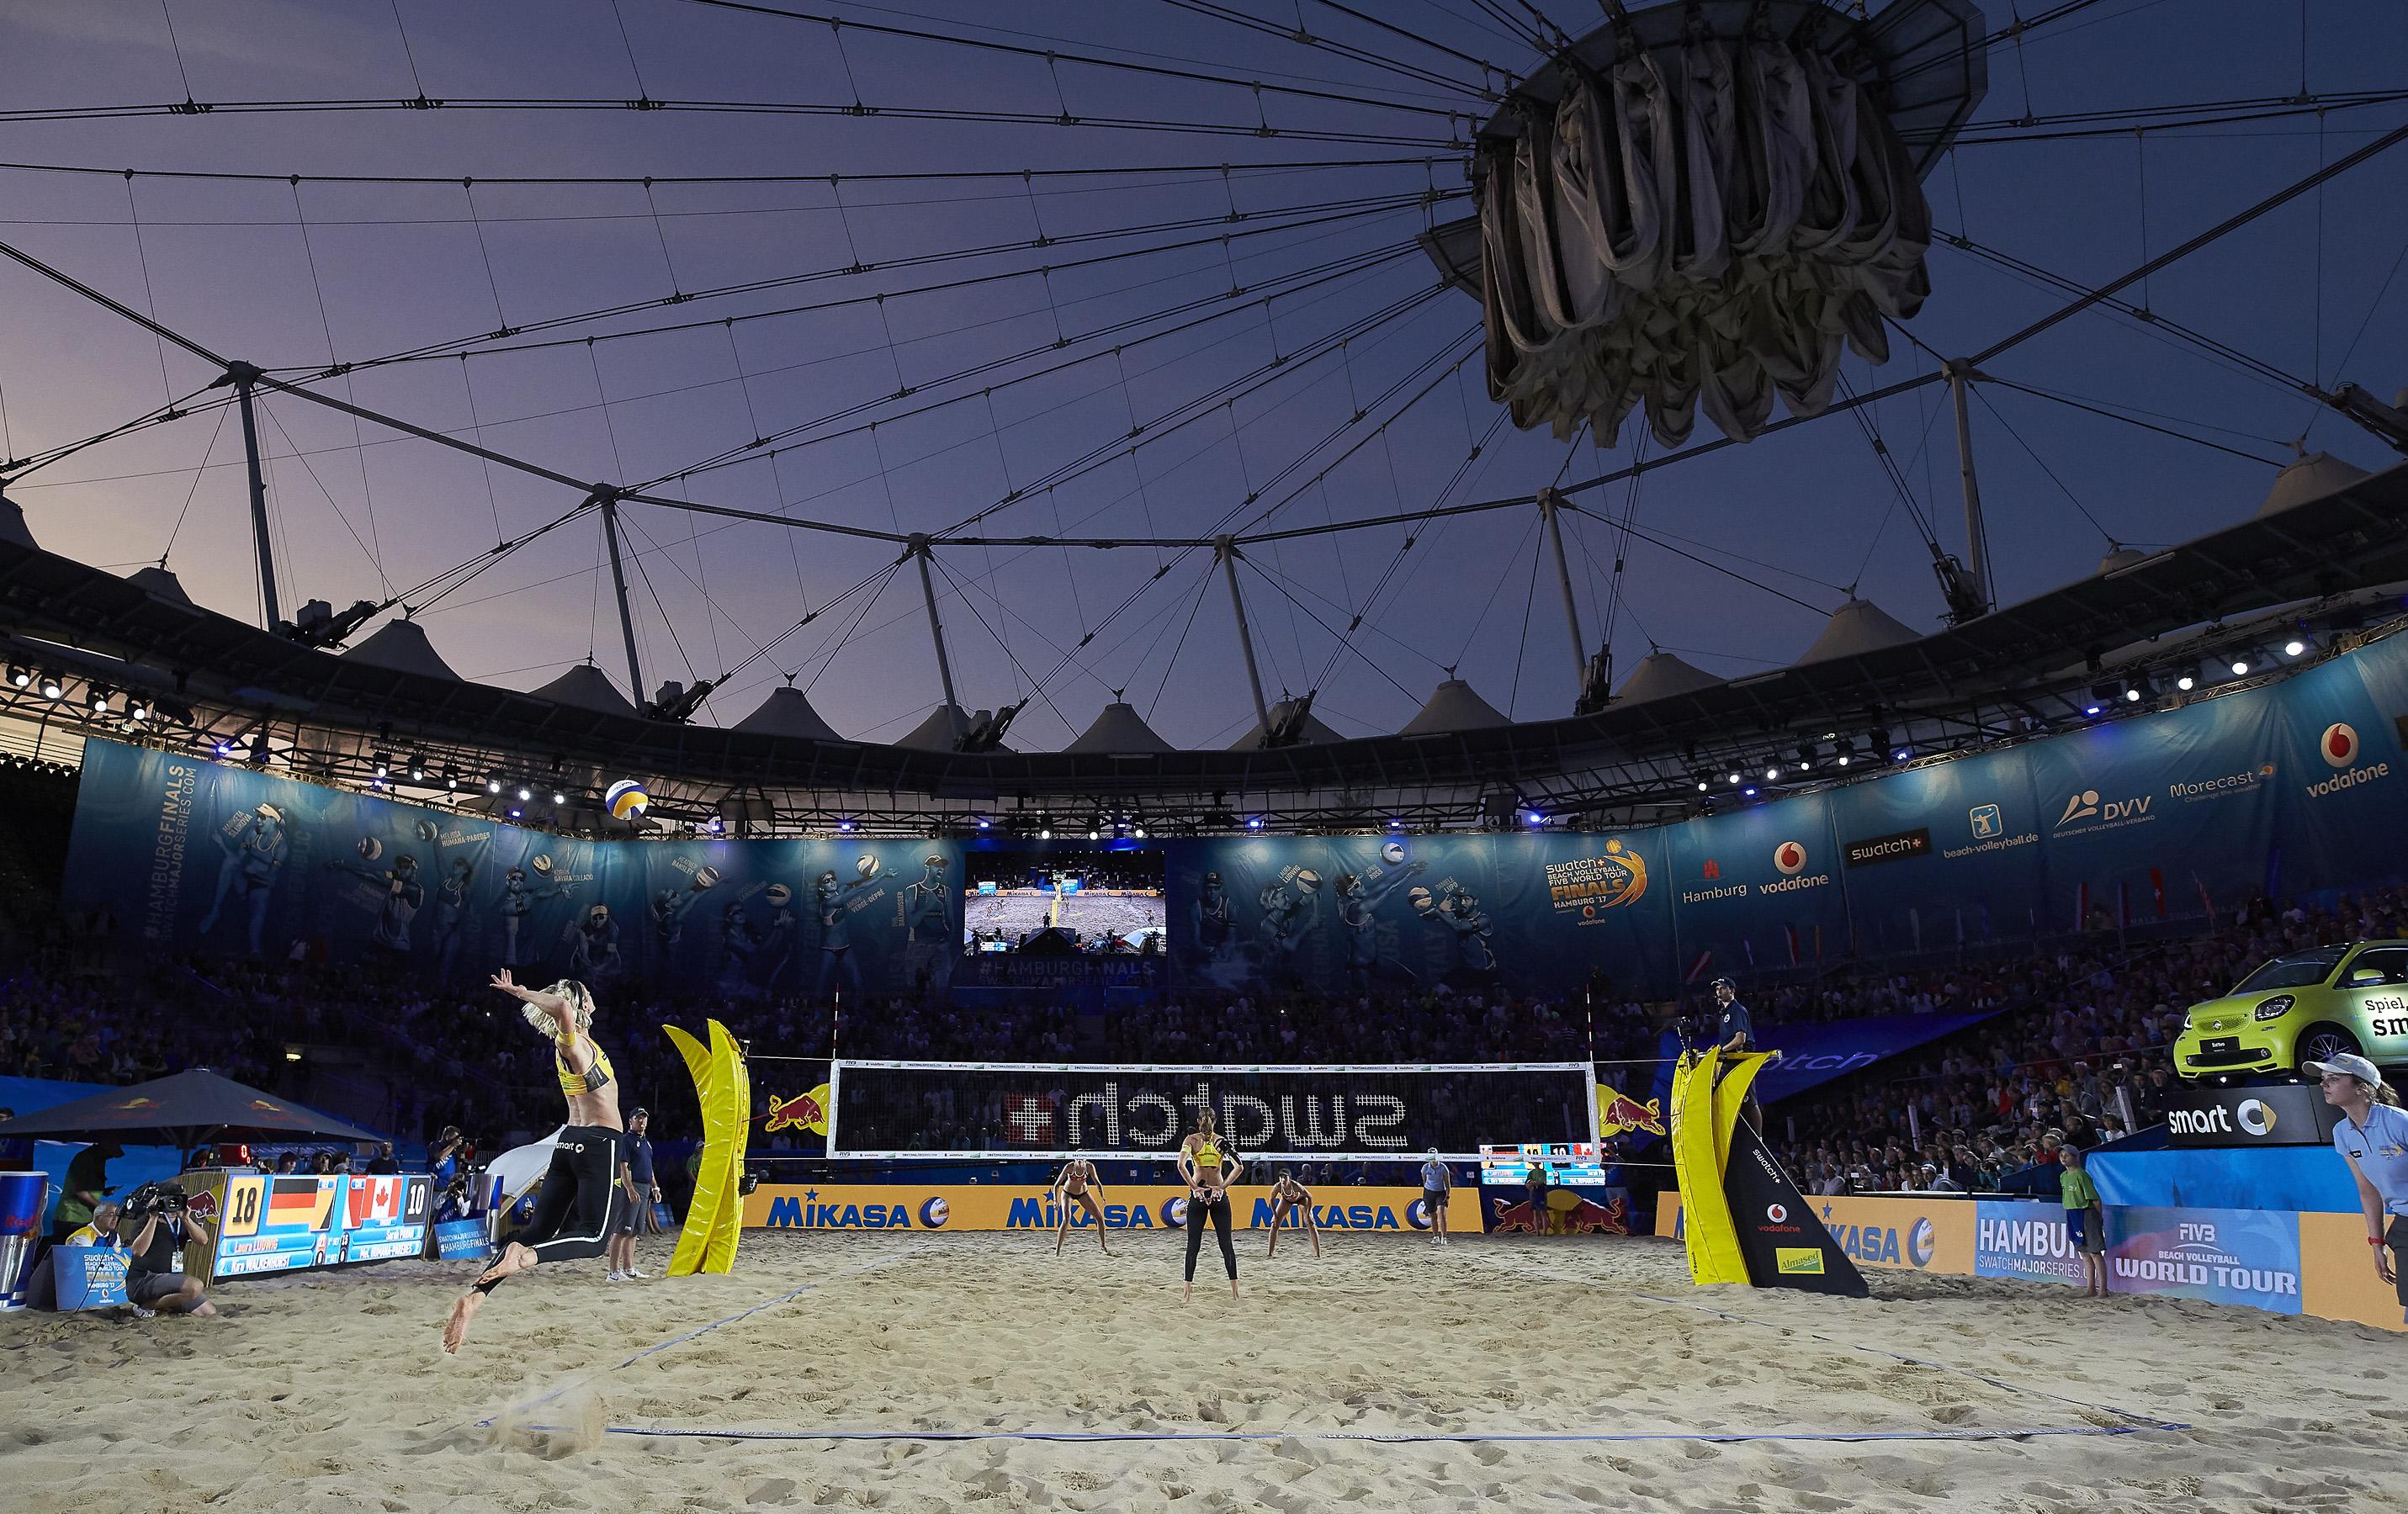 Portfolio(2017-08-25 – Beachvolleyball World Tour Finals Hamburg – 335)